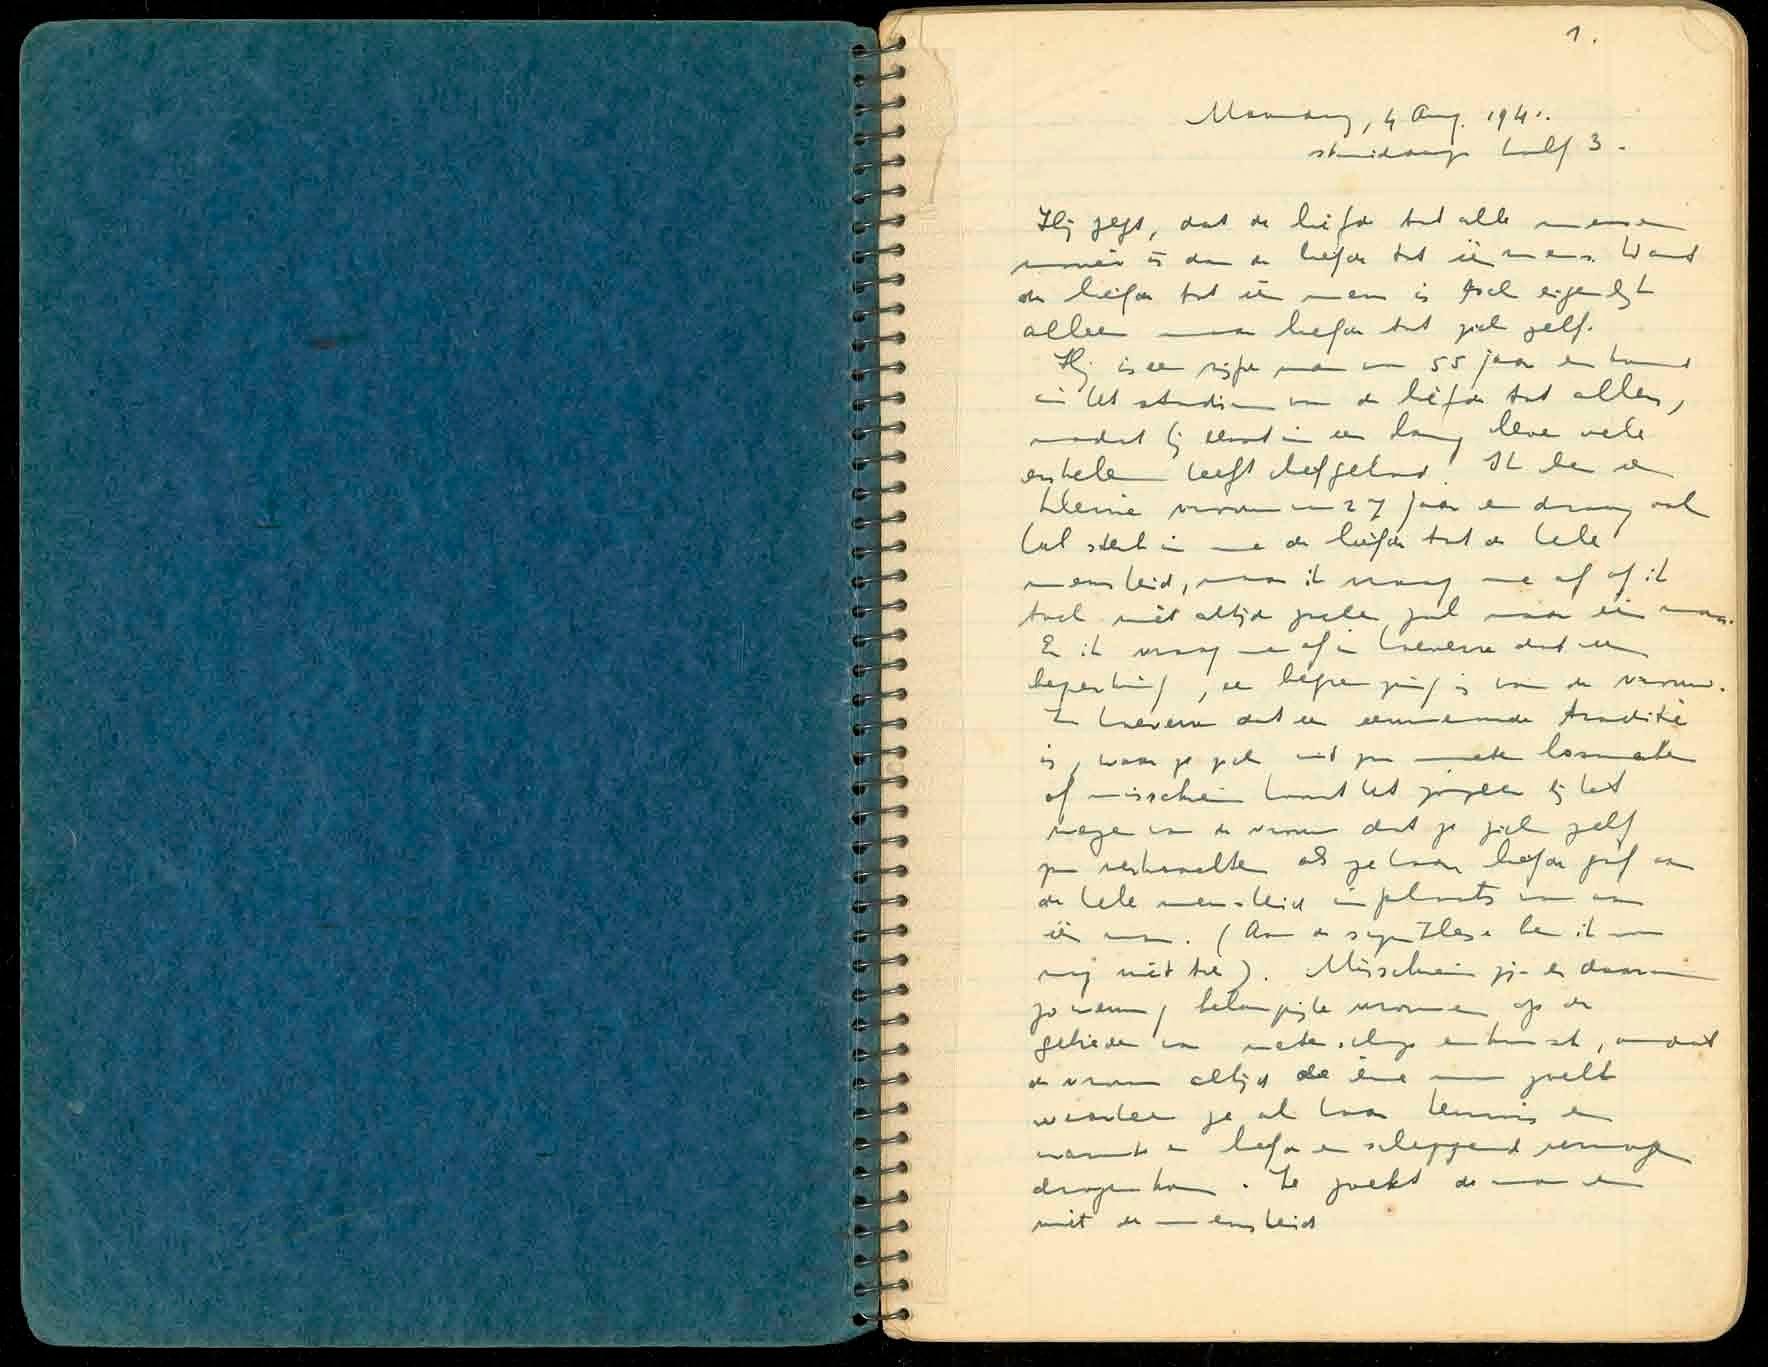 Dagboek_Etty_Hillesum,_deel_1